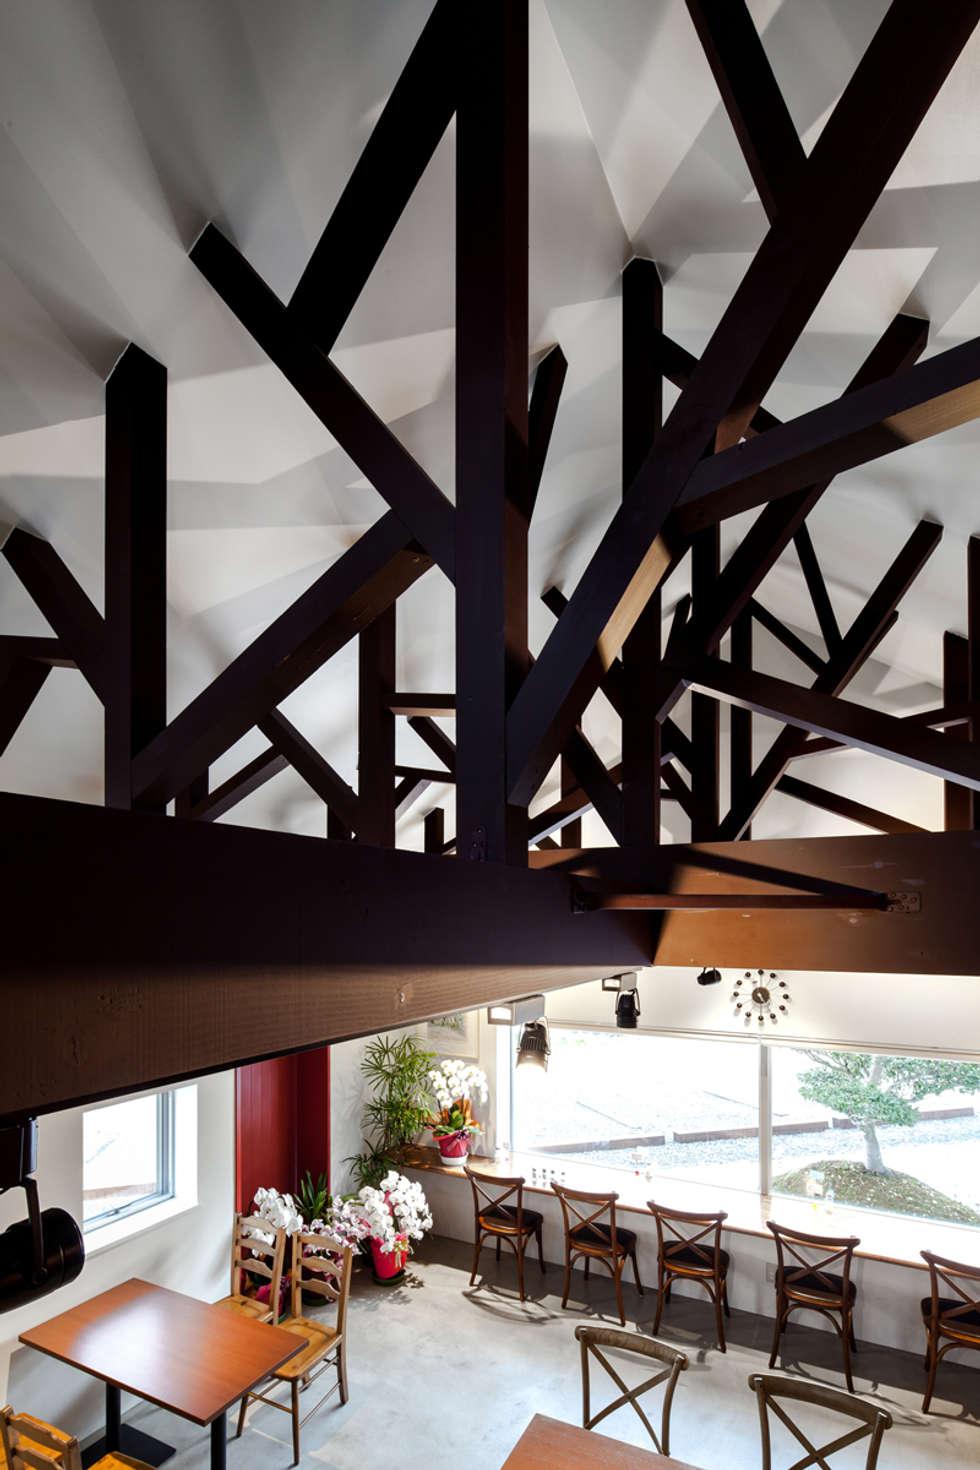 Mirrors: bandesignが手掛けたレストランです。